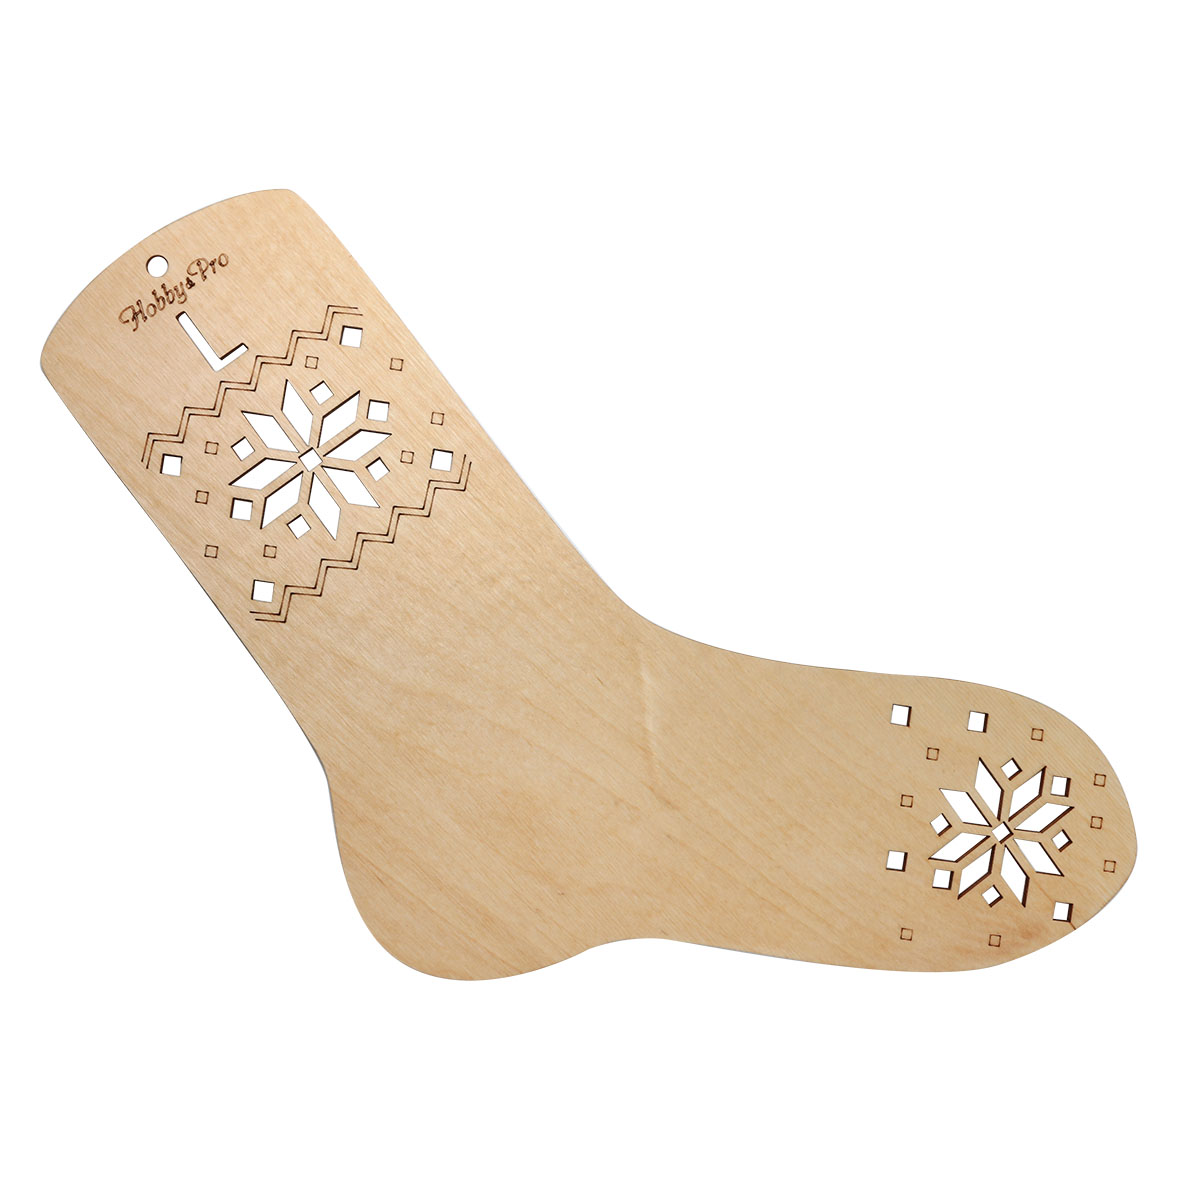 НВ-001 Блокатор-шаблон для вязания носка L (26 см по стельке), фанера Hobby&Pro